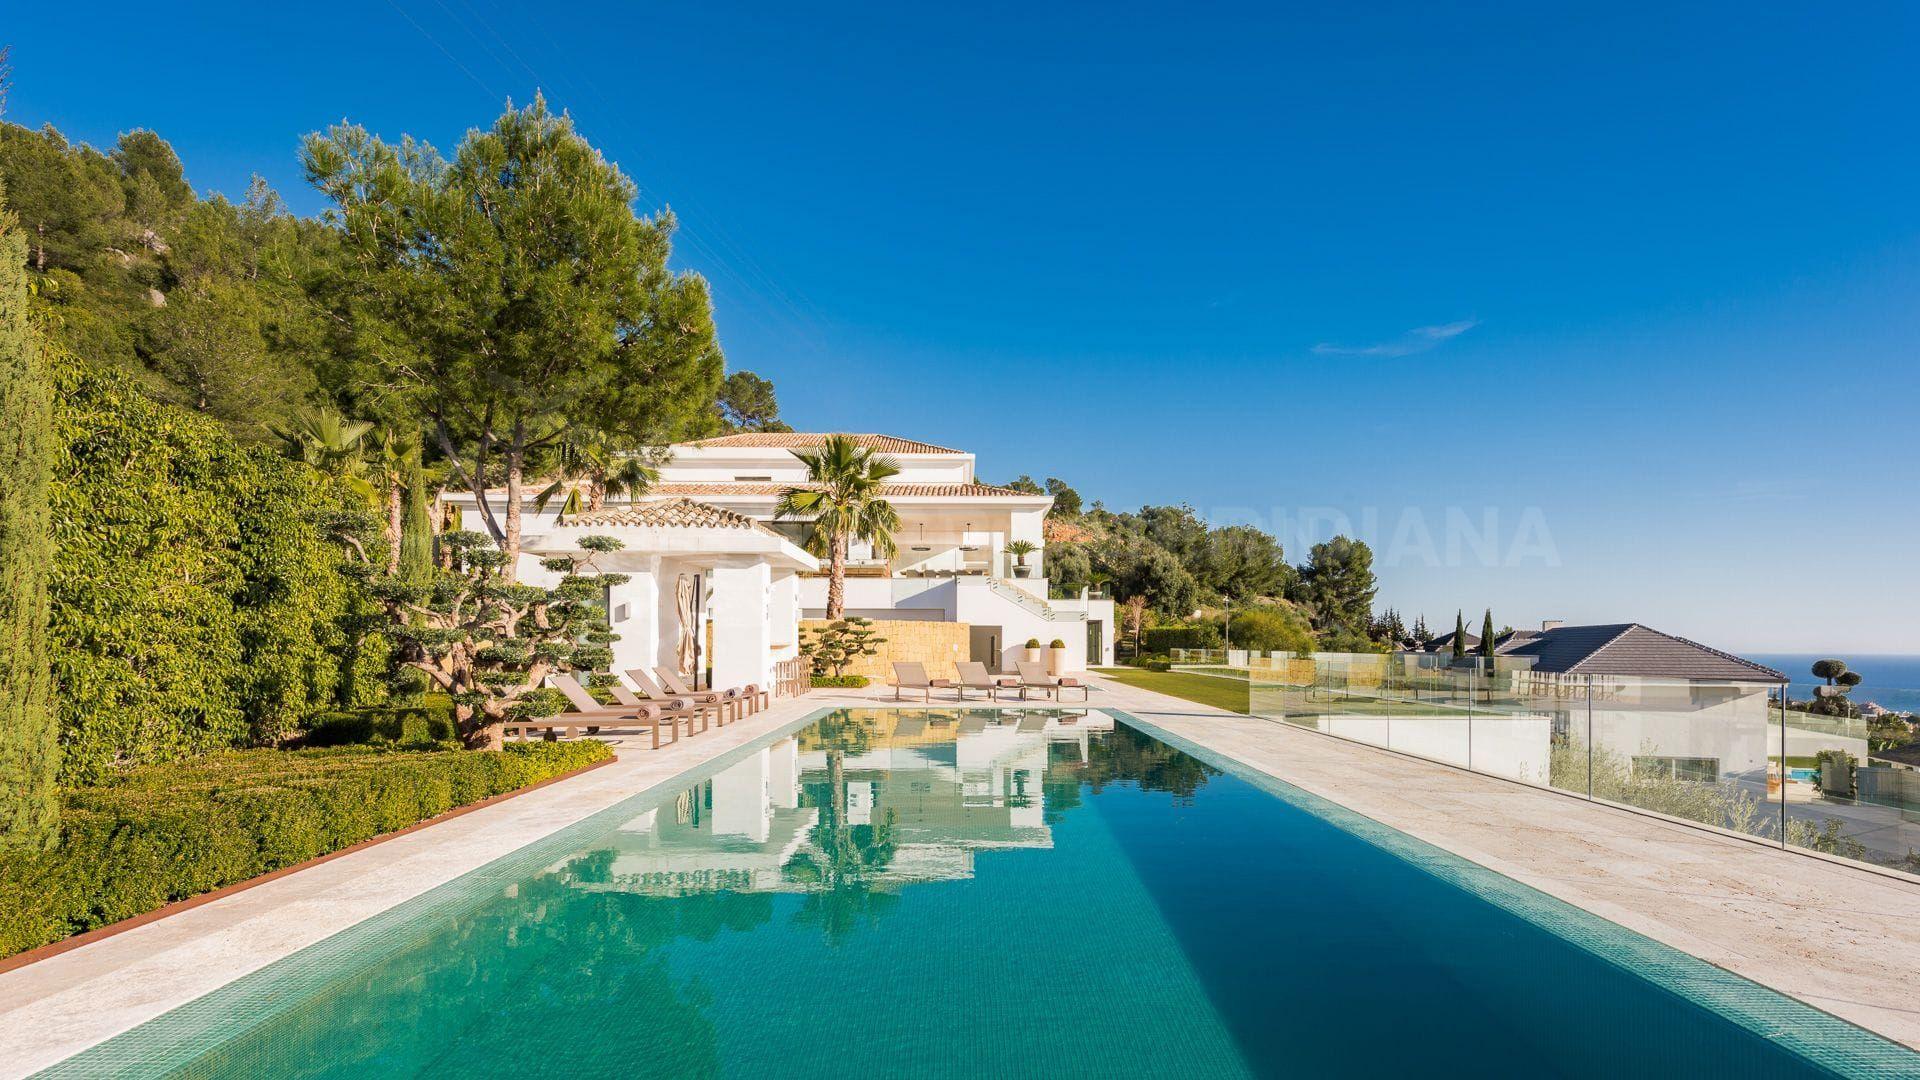 Terra Meridiana announces exclusive opportunity to market exceptional luxury villa in Cascada de Camojan